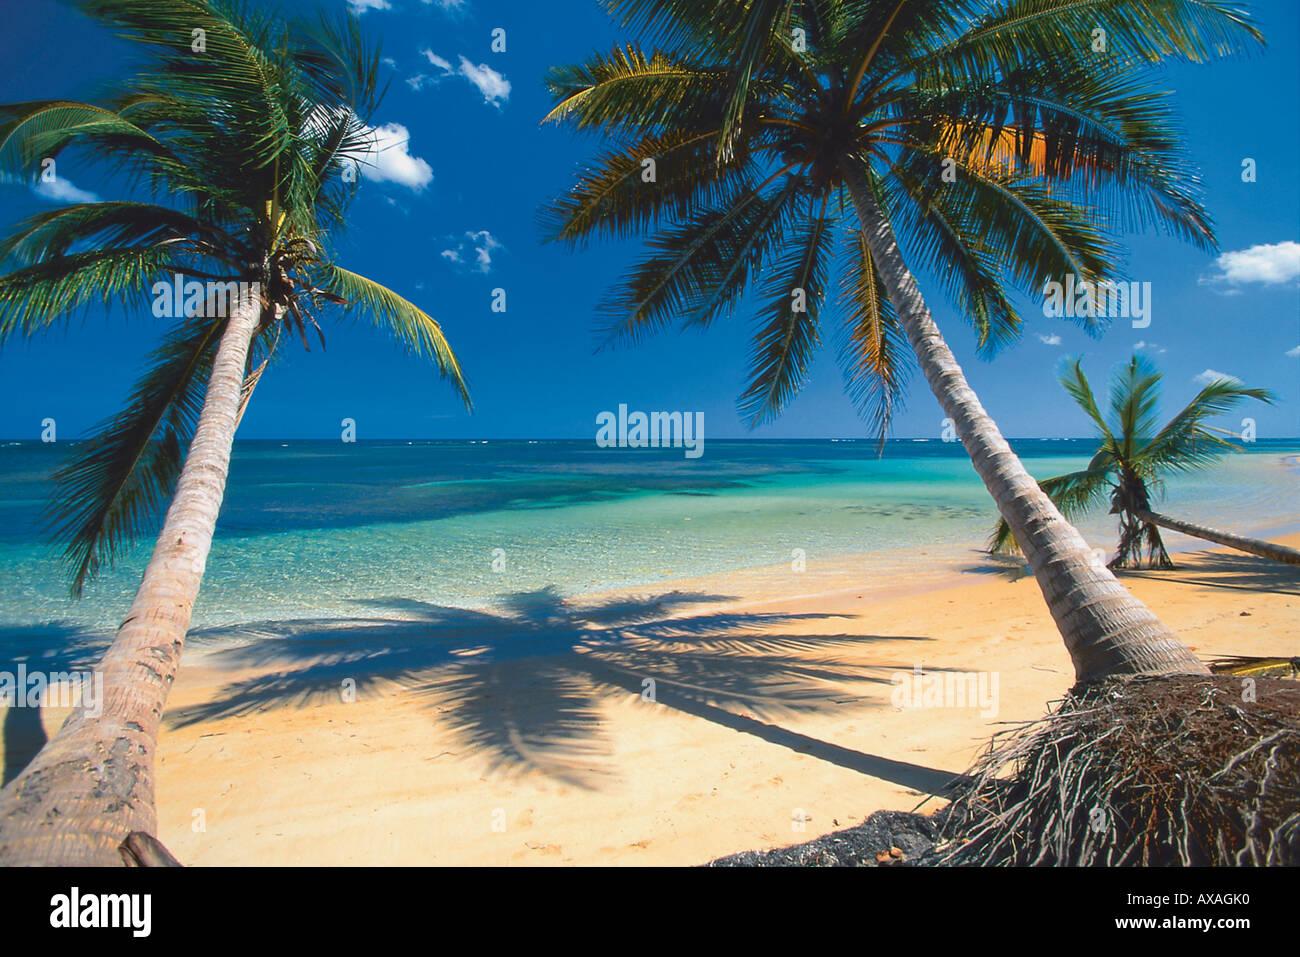 Strang, Dominikanische Republik Karibik Stockbild